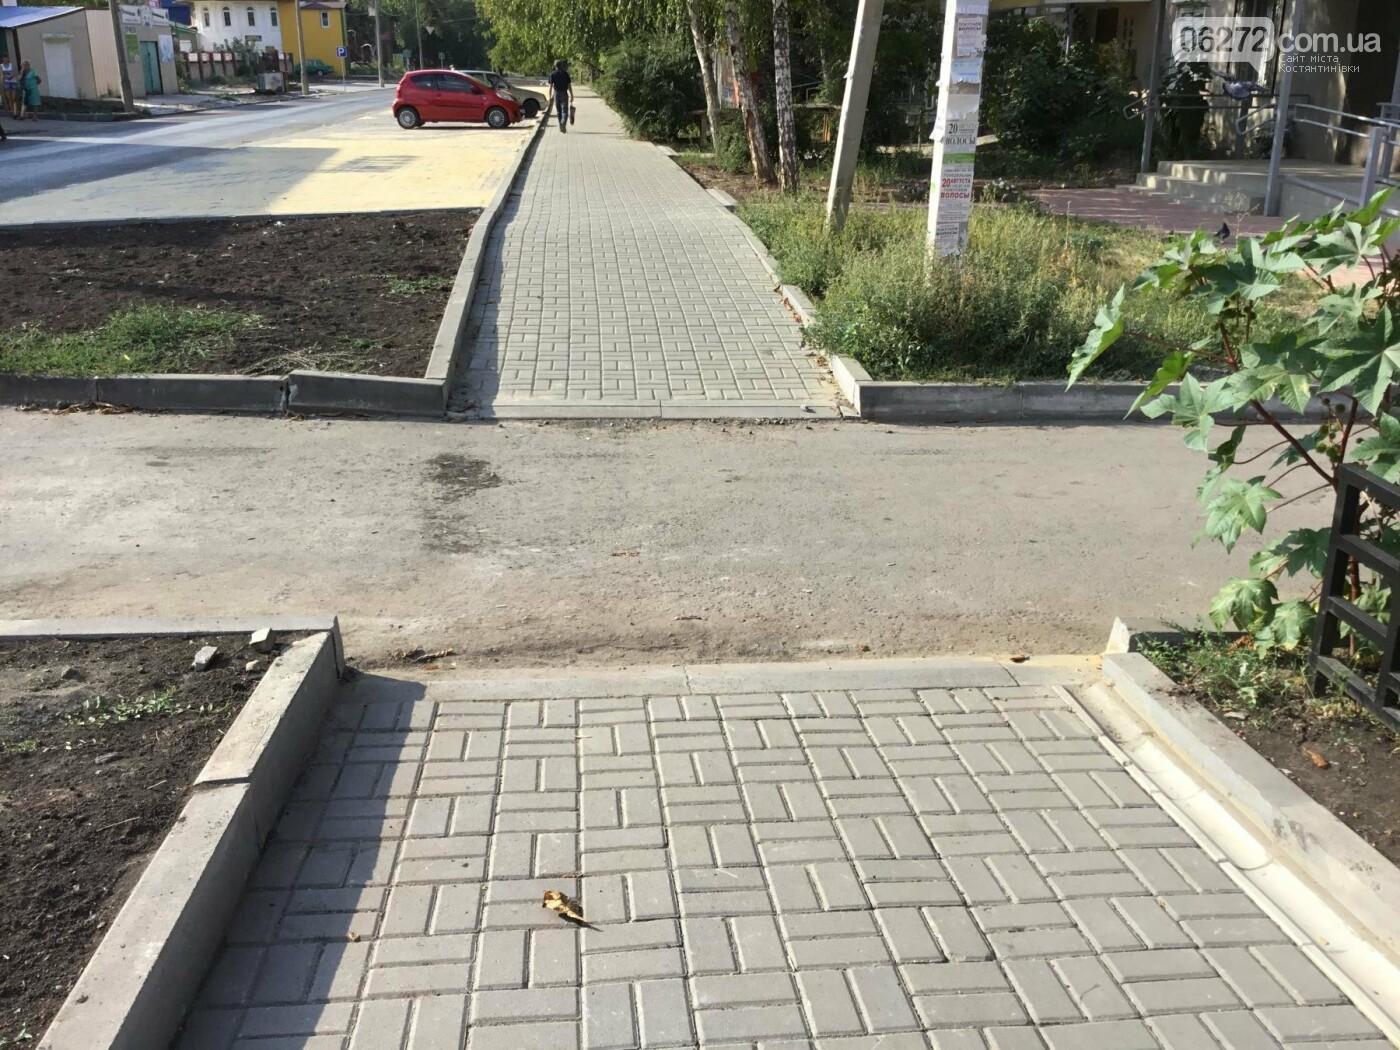 Дорога после ремонта по ул. Леваневского в Константиновке, фото-16